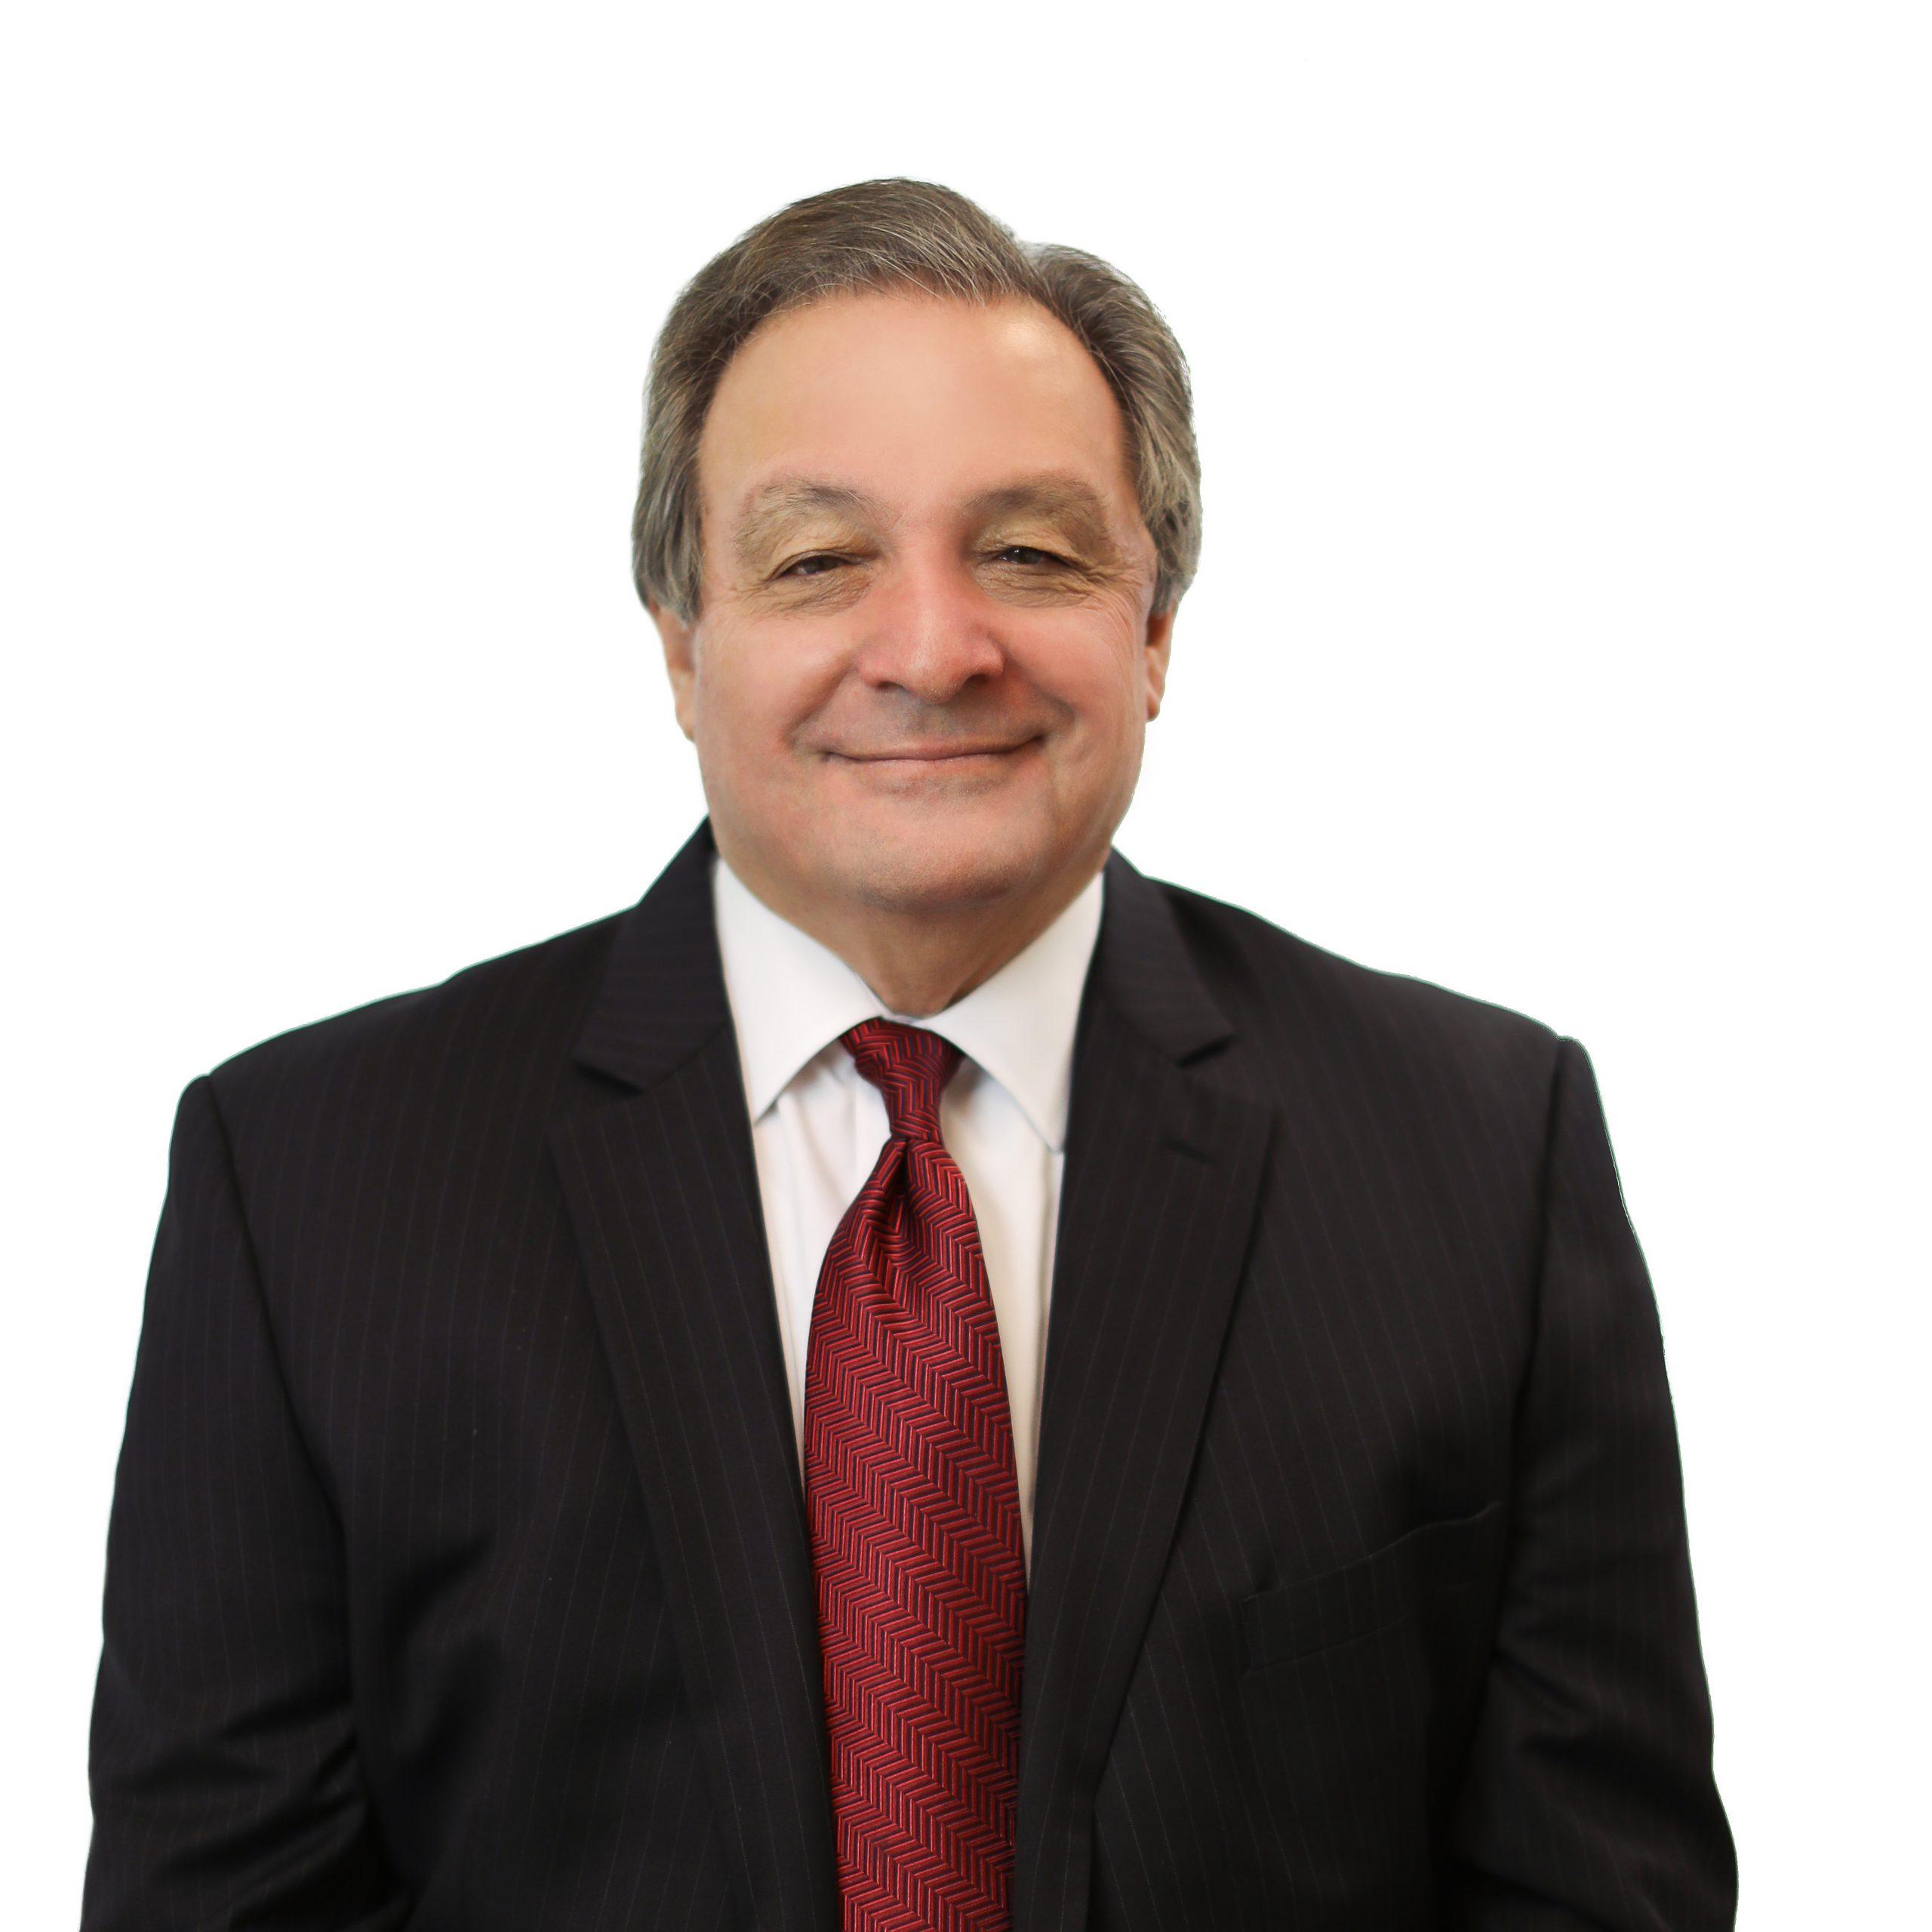 Jeffrey Fenster - Attorney At Law